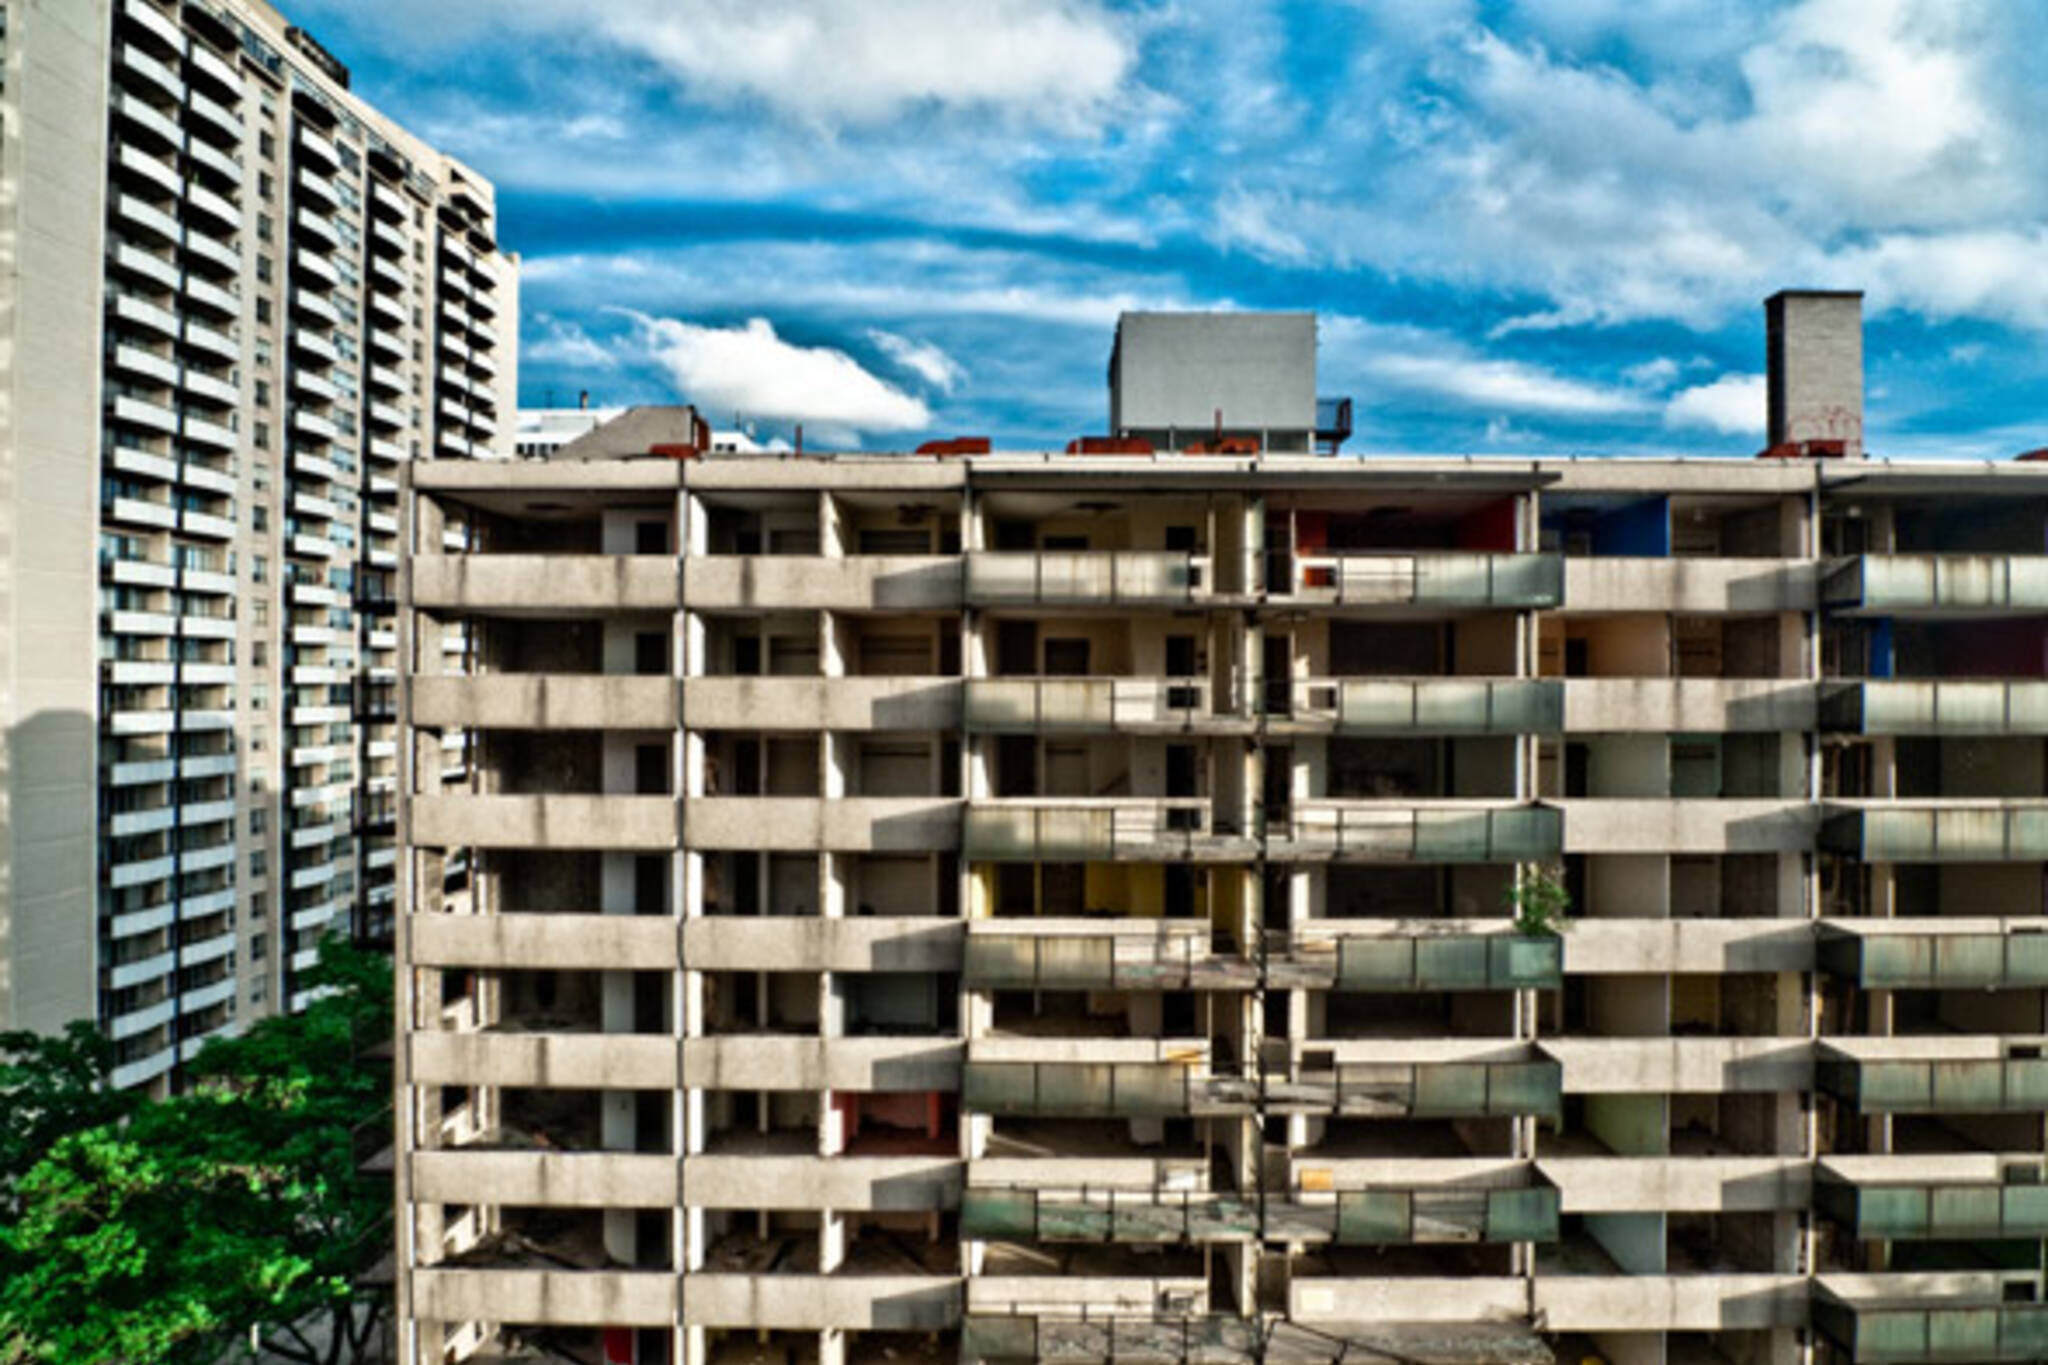 Tweedsmuir Apartment demolition